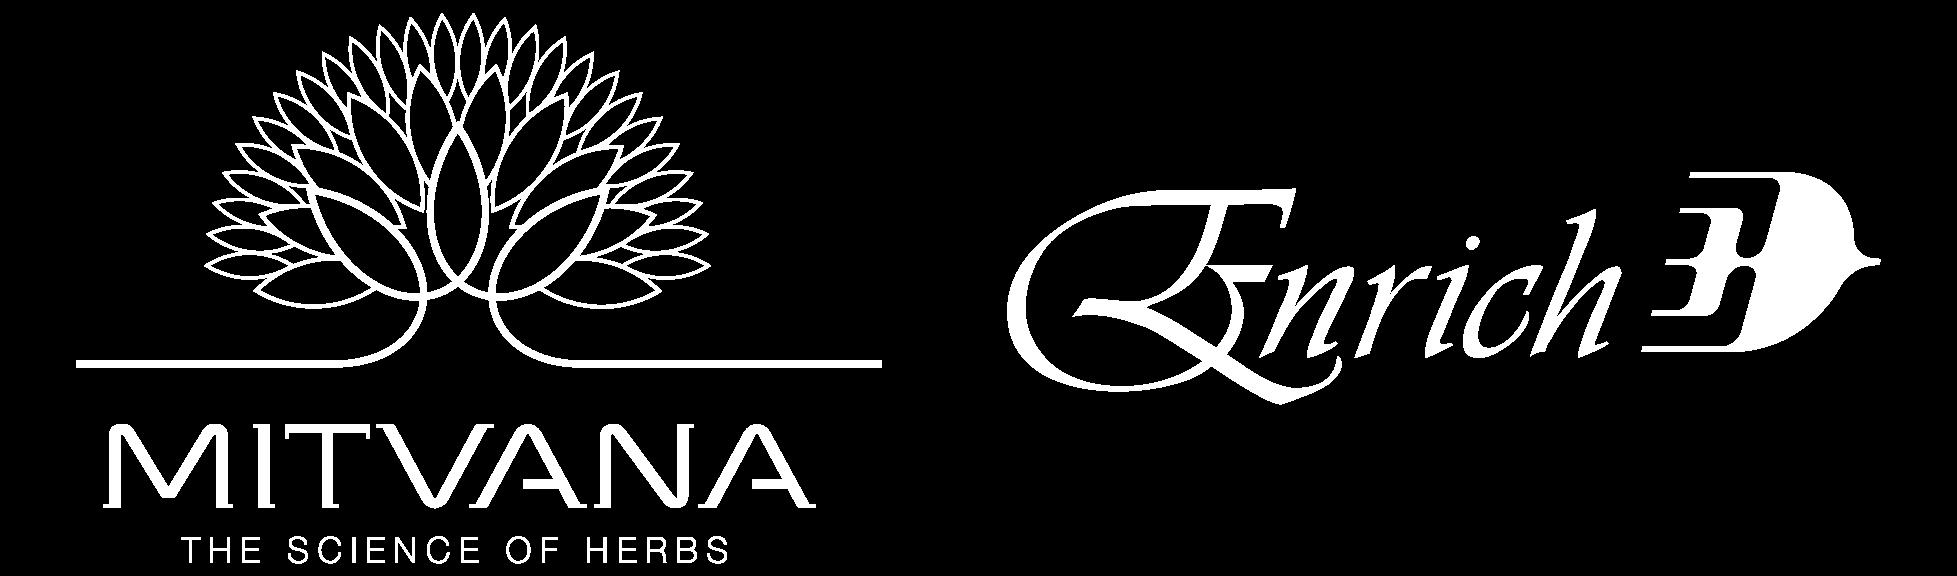 Mitvana Asia MH Site